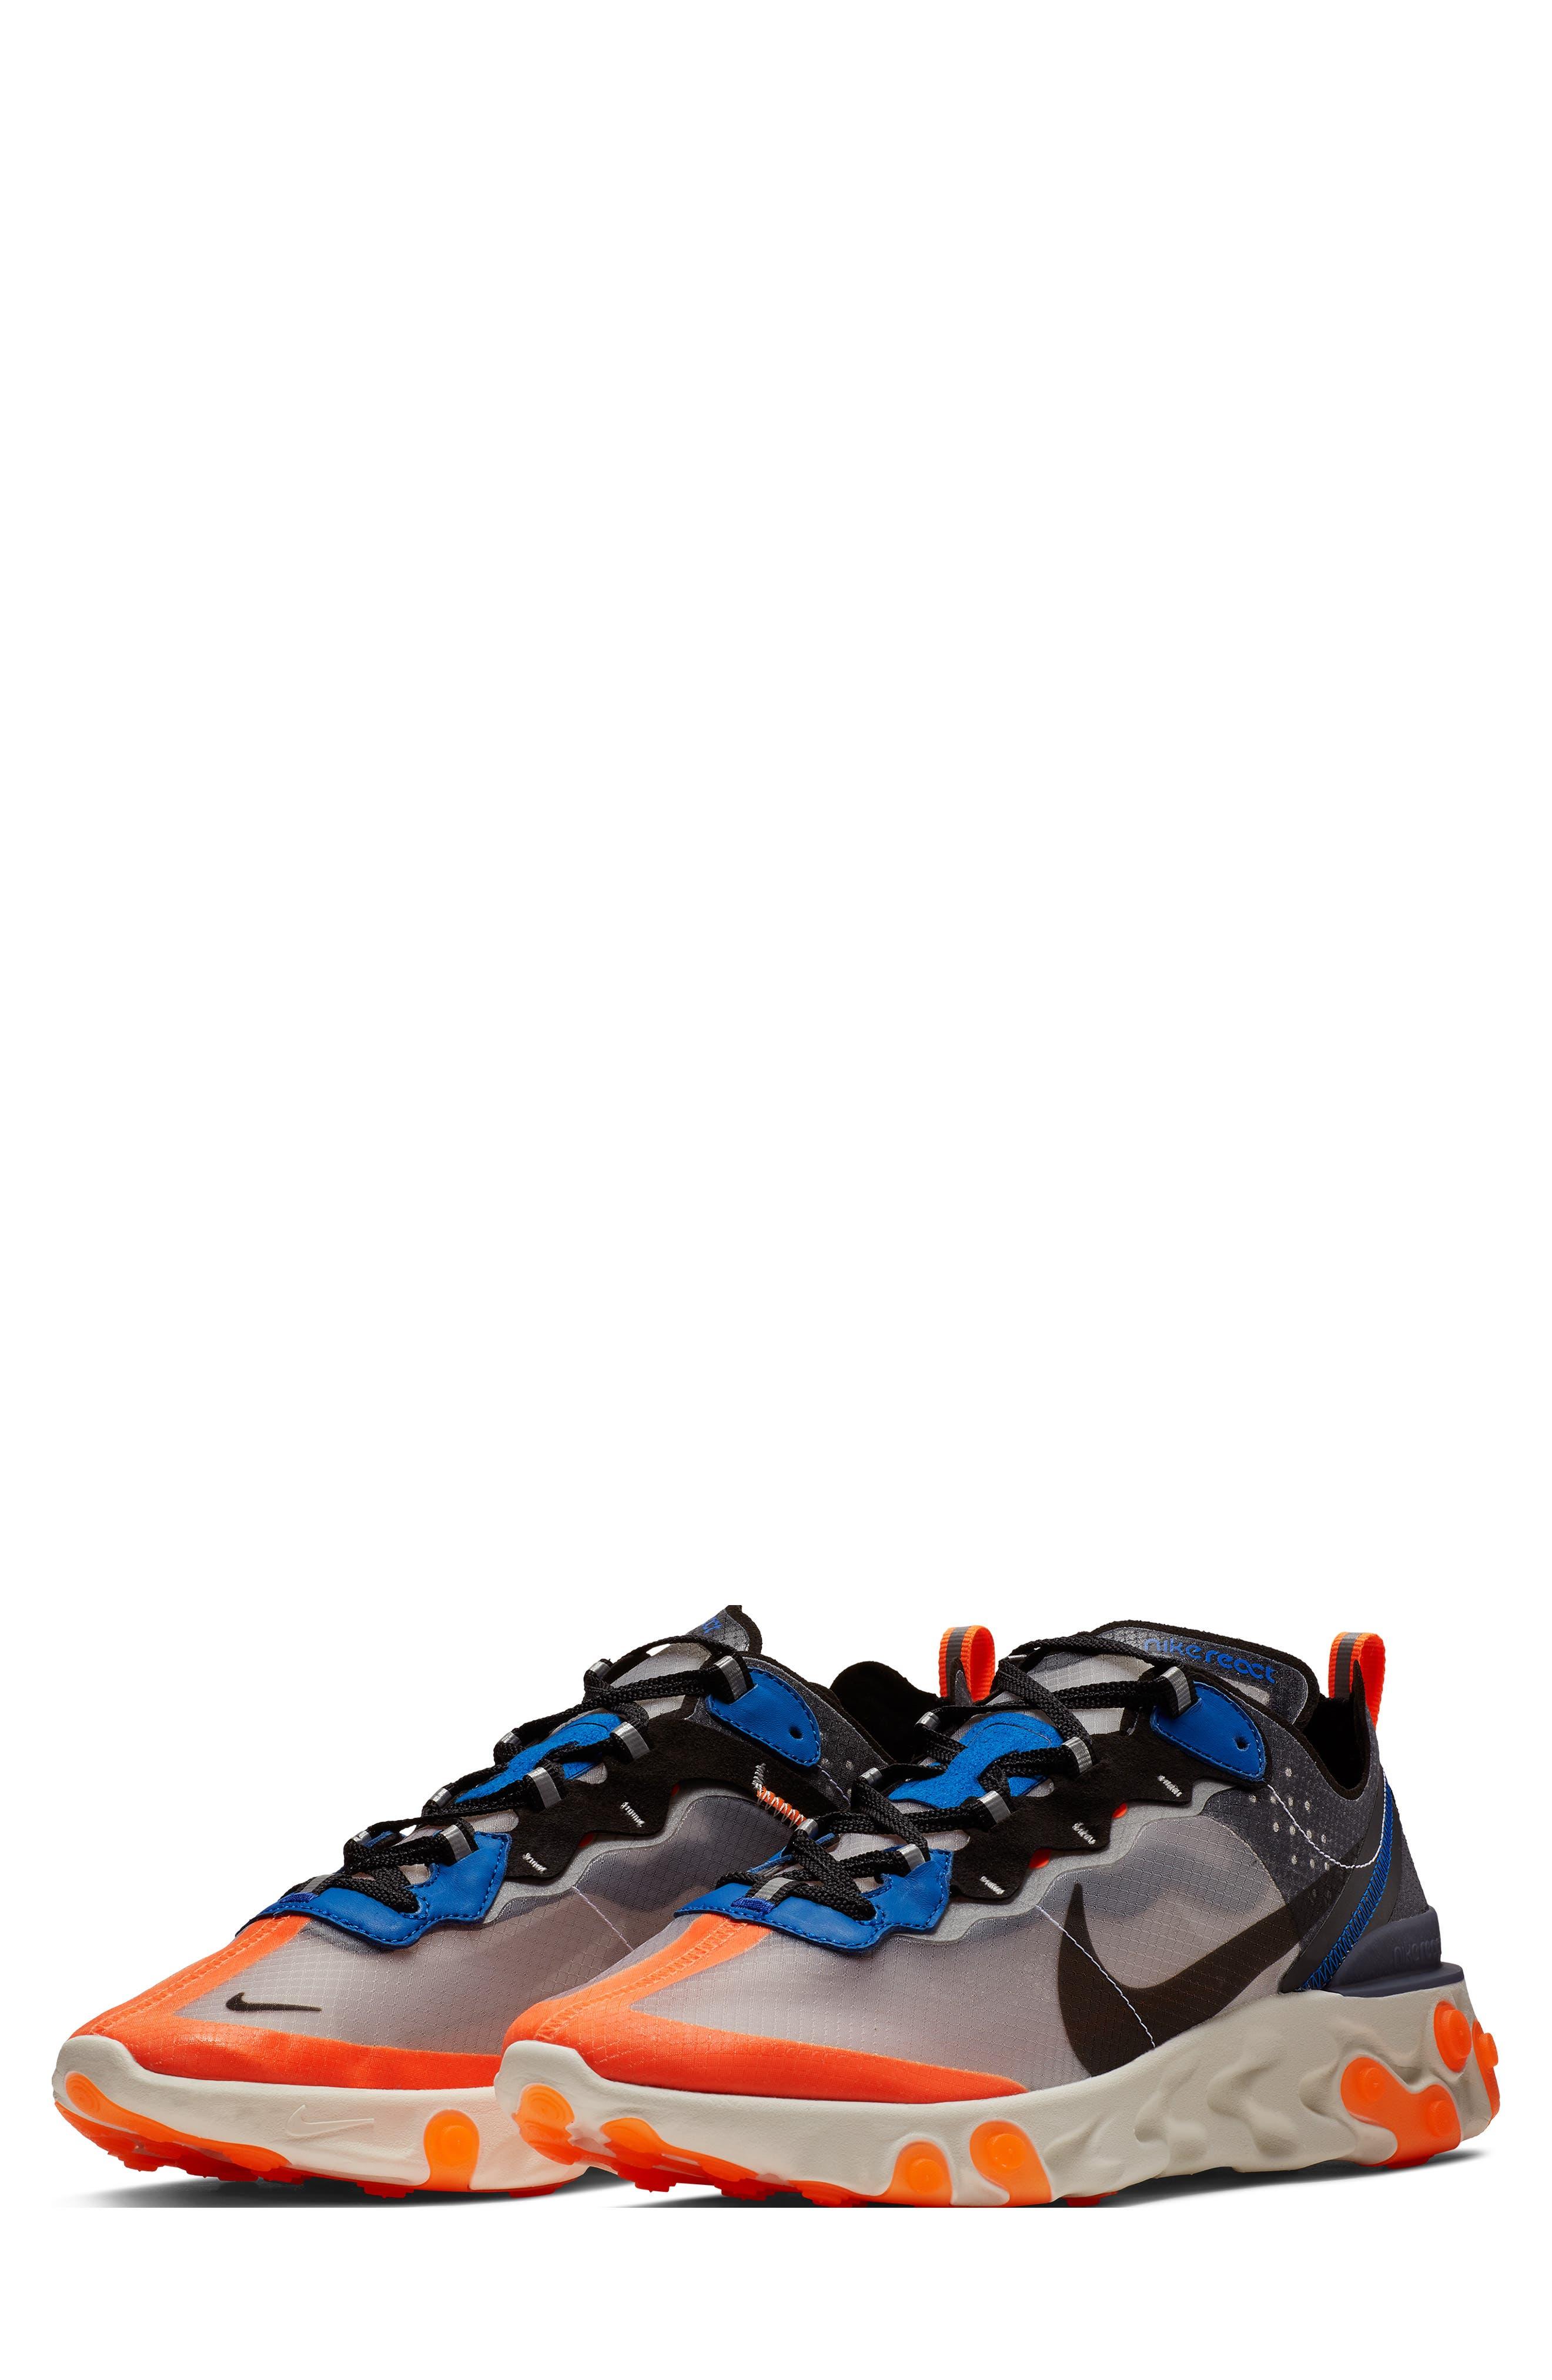 React Element 87 Sneaker,                             Main thumbnail 1, color,                             021